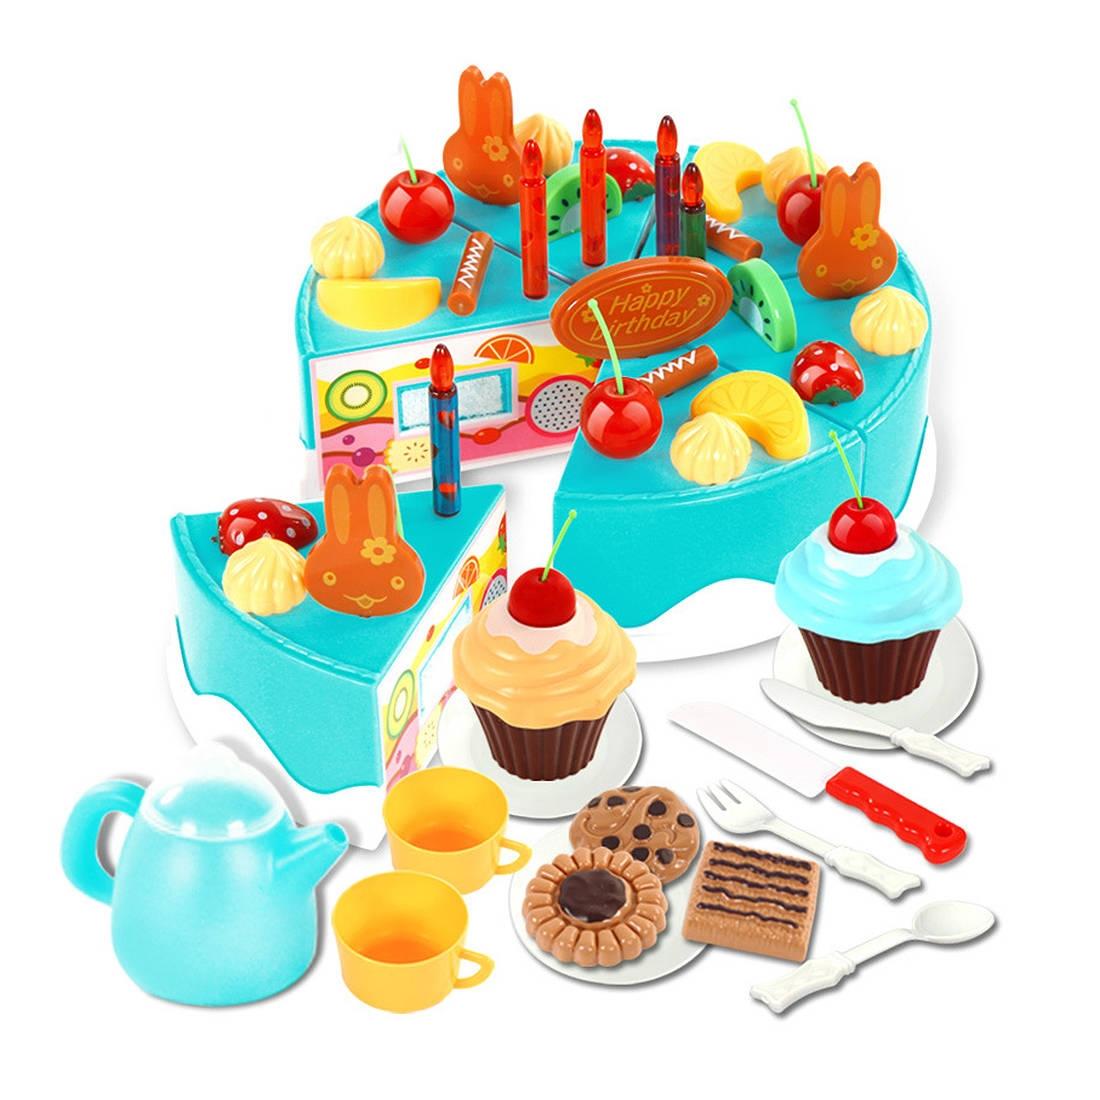 Buy Generic 54Pcs Plastic Kitchen Cutting Toy Birthday Cake Pretend ...